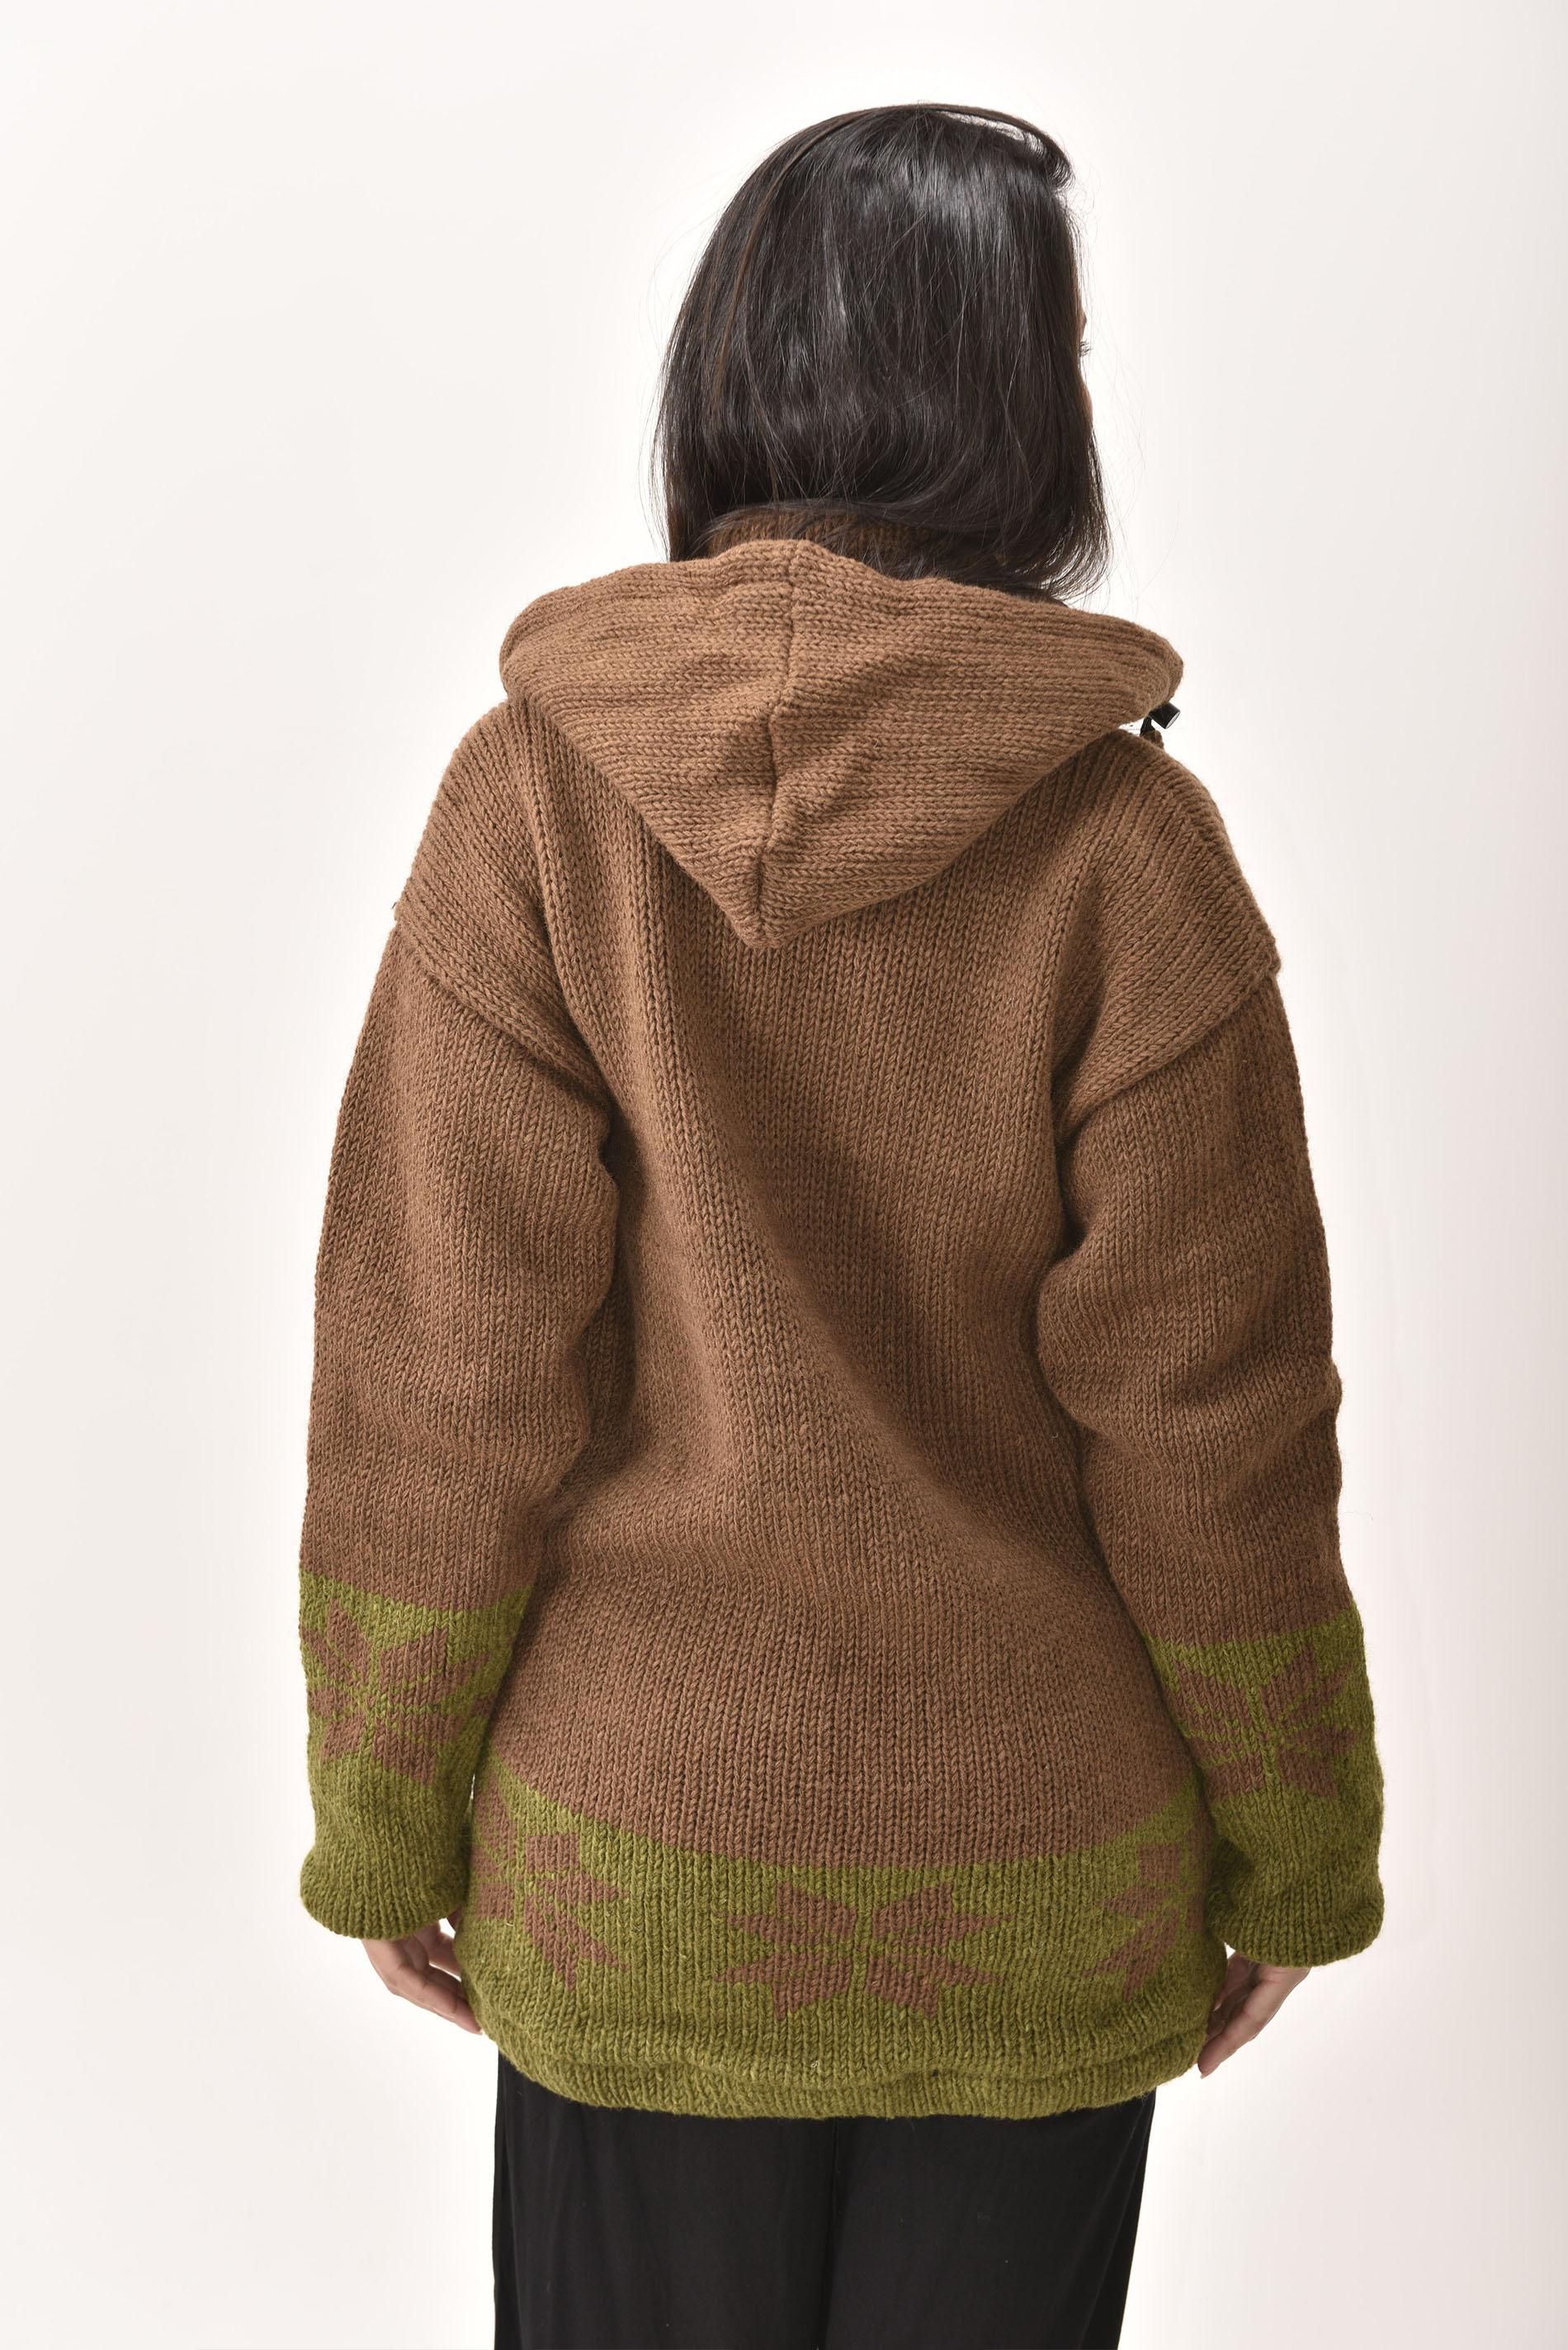 Himalayan Mountain Jacket Long Length Snowflake, Brown